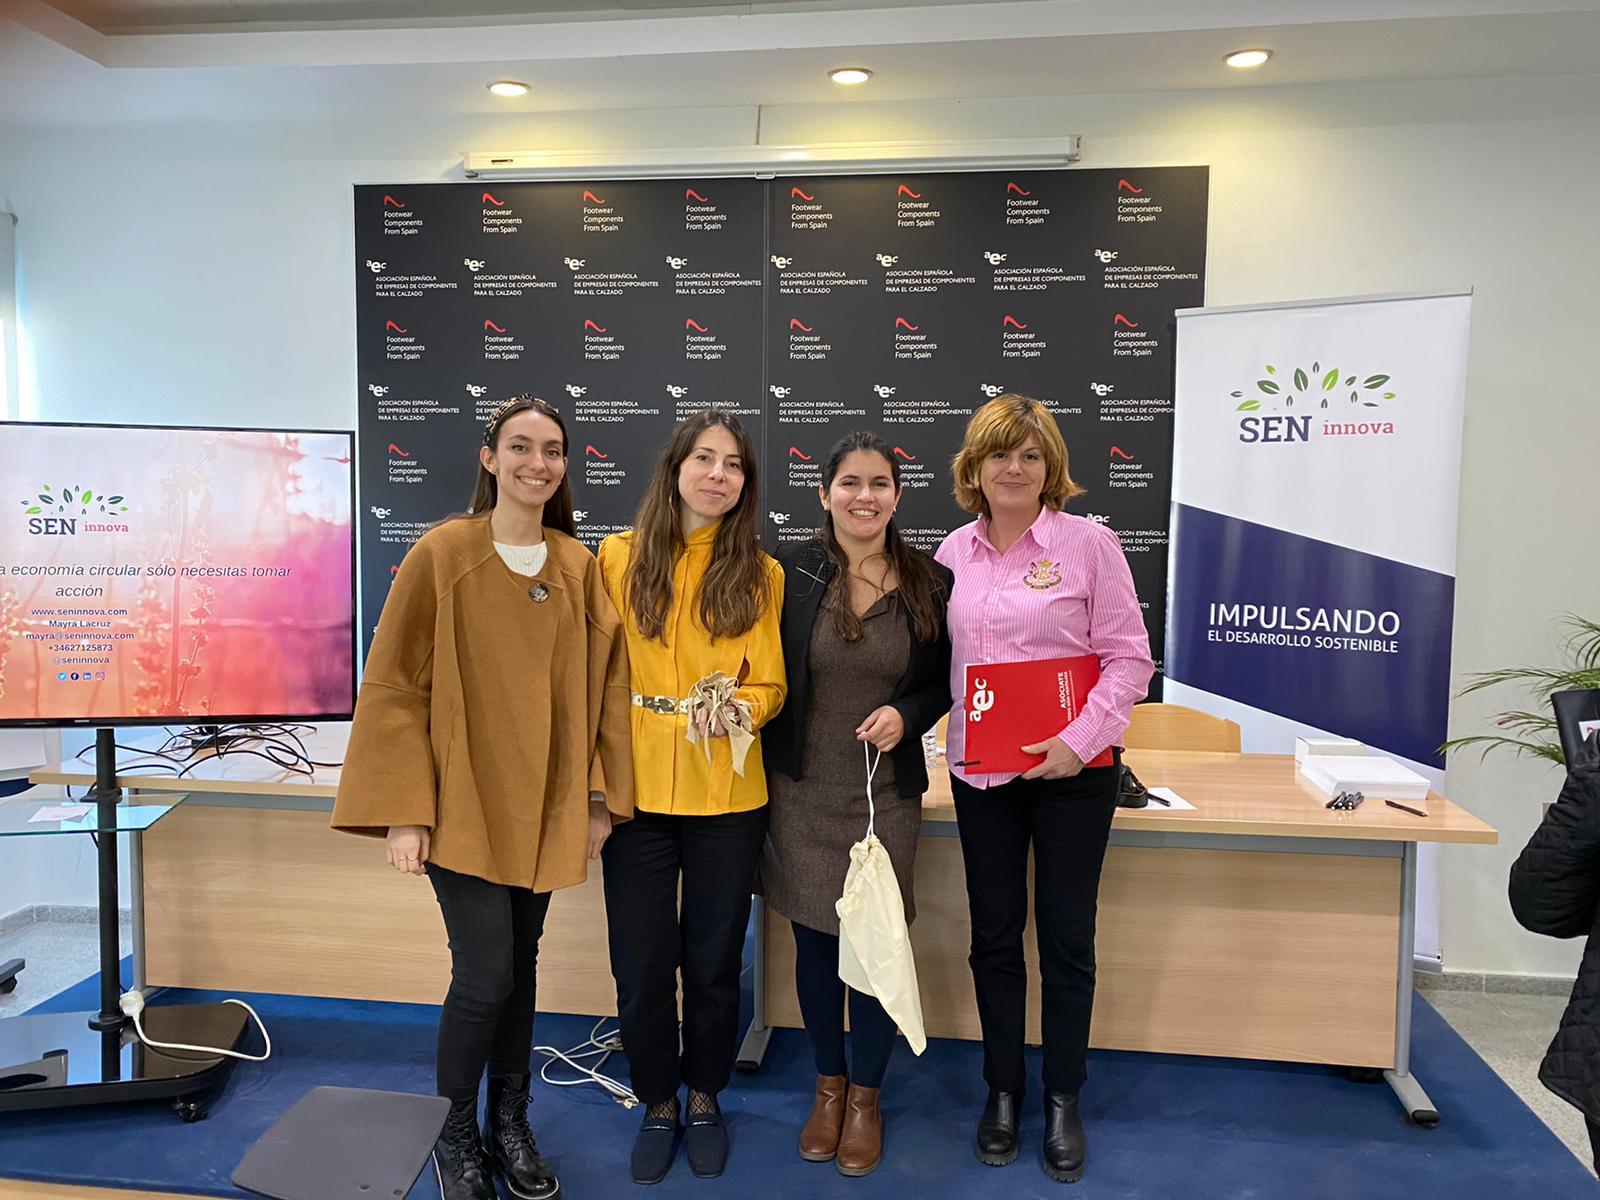 Asociación Española de Empresas de Componentes para el Calzado SEN innova